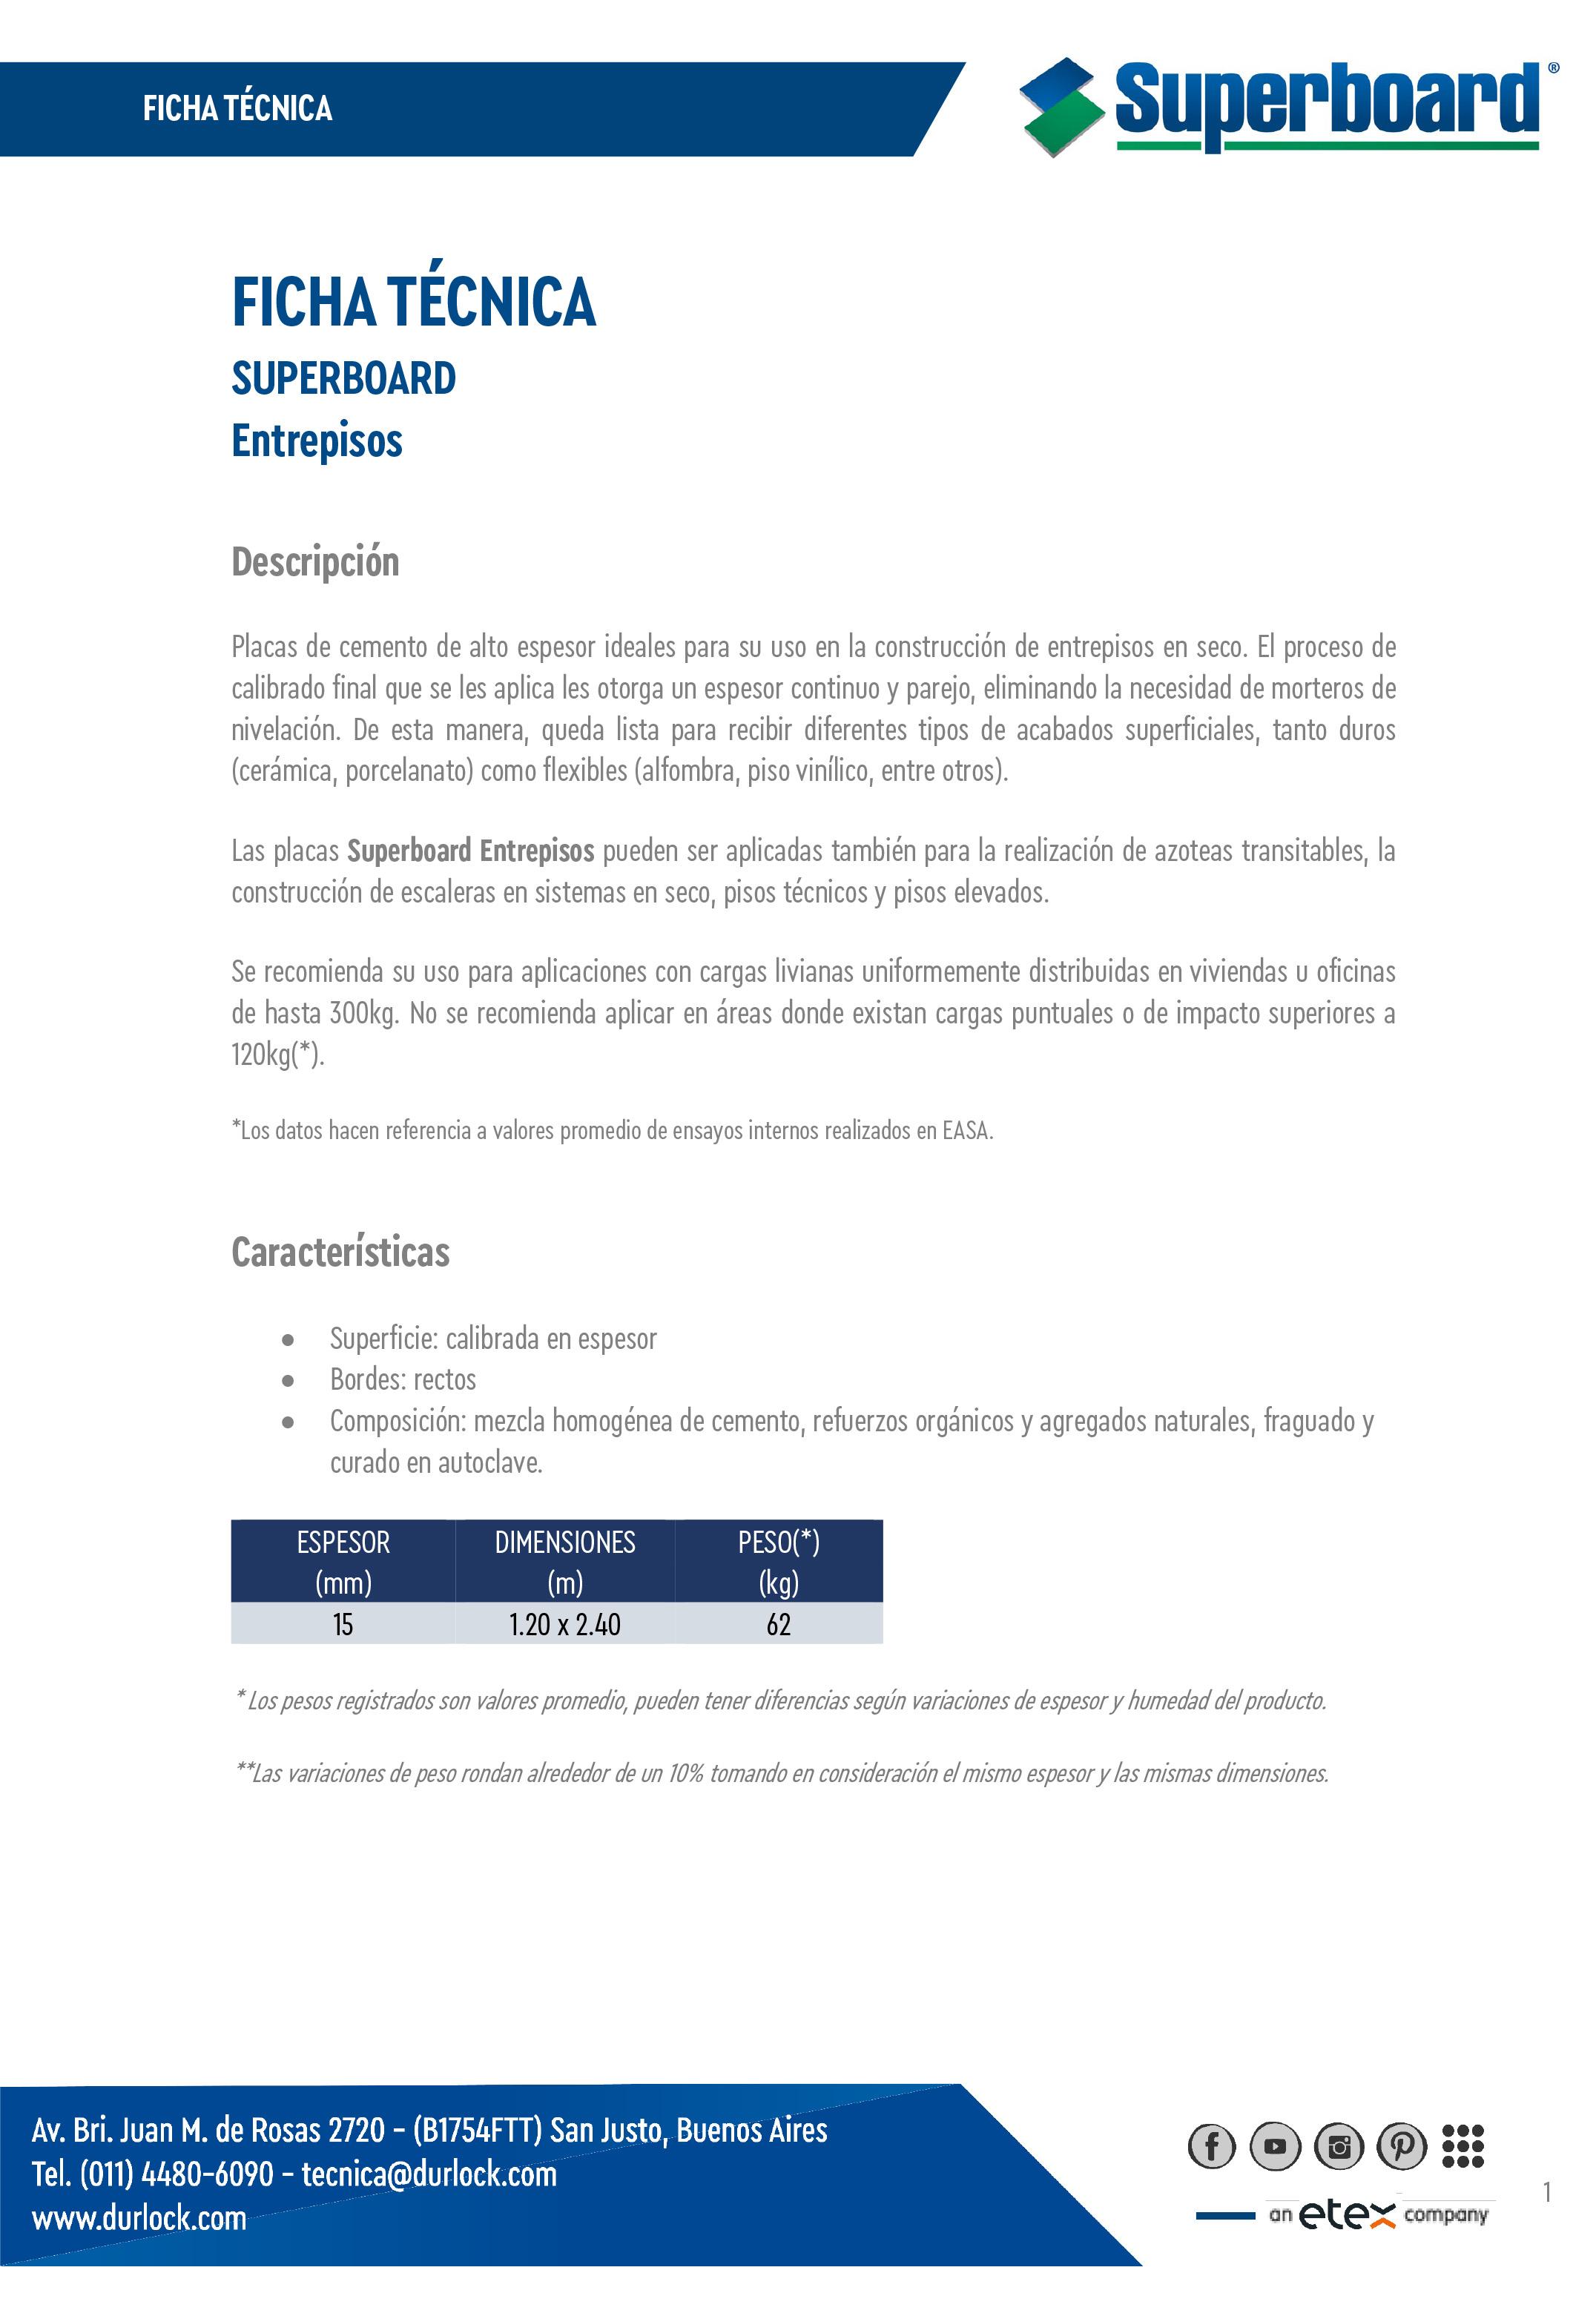 Ficha Técnica Superboard Entrepisos